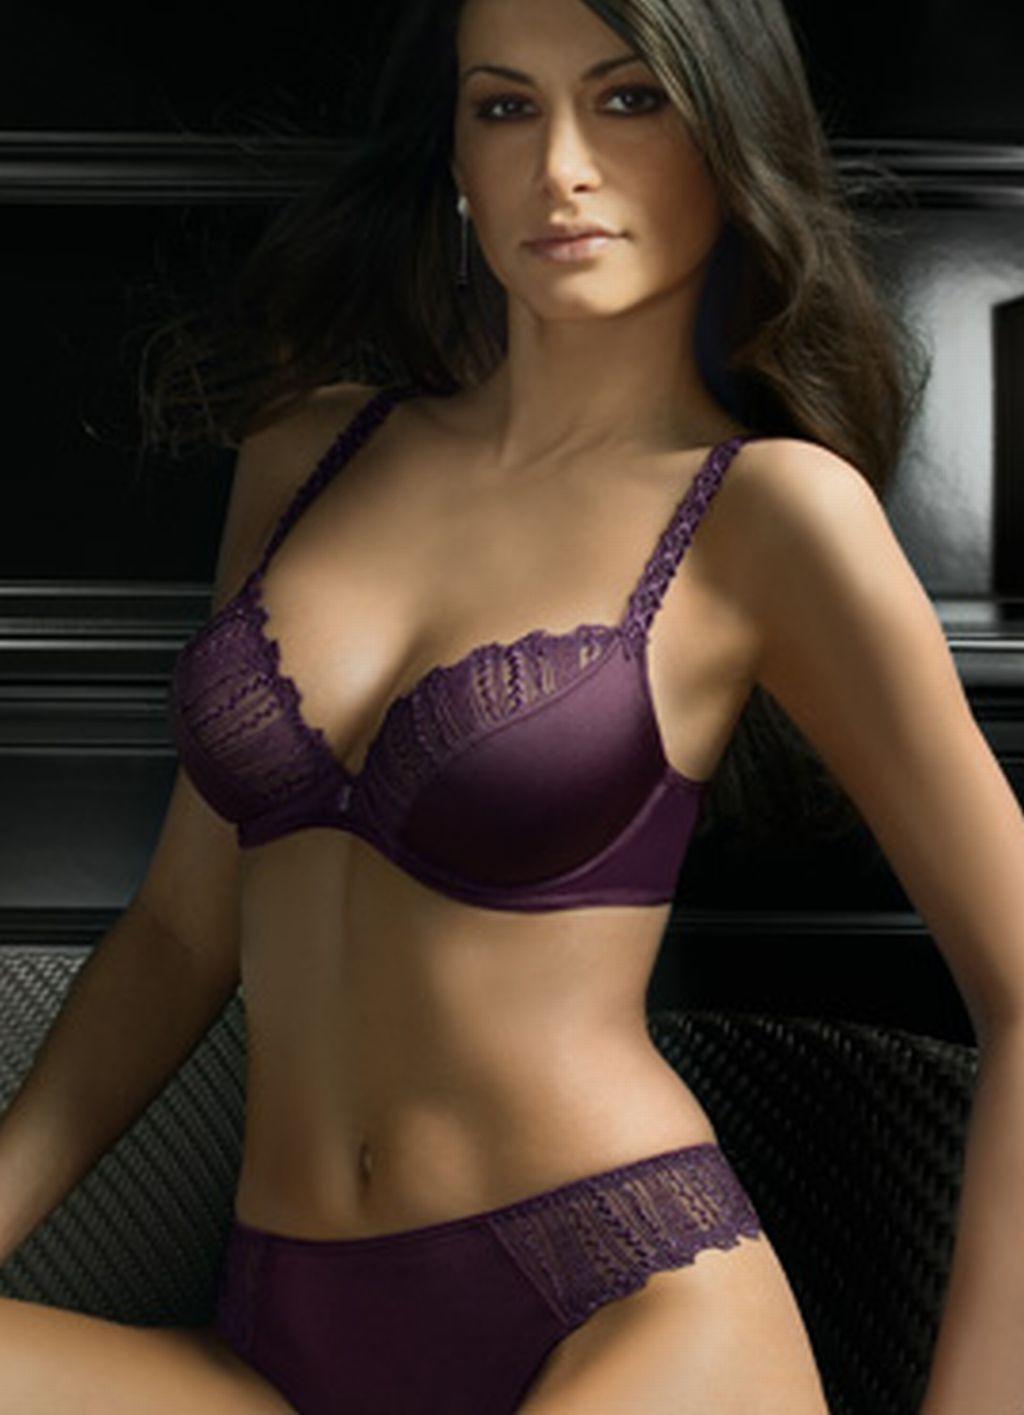 Podprsenka 80609 - Felina Barva: tělová, Velikost: 75B